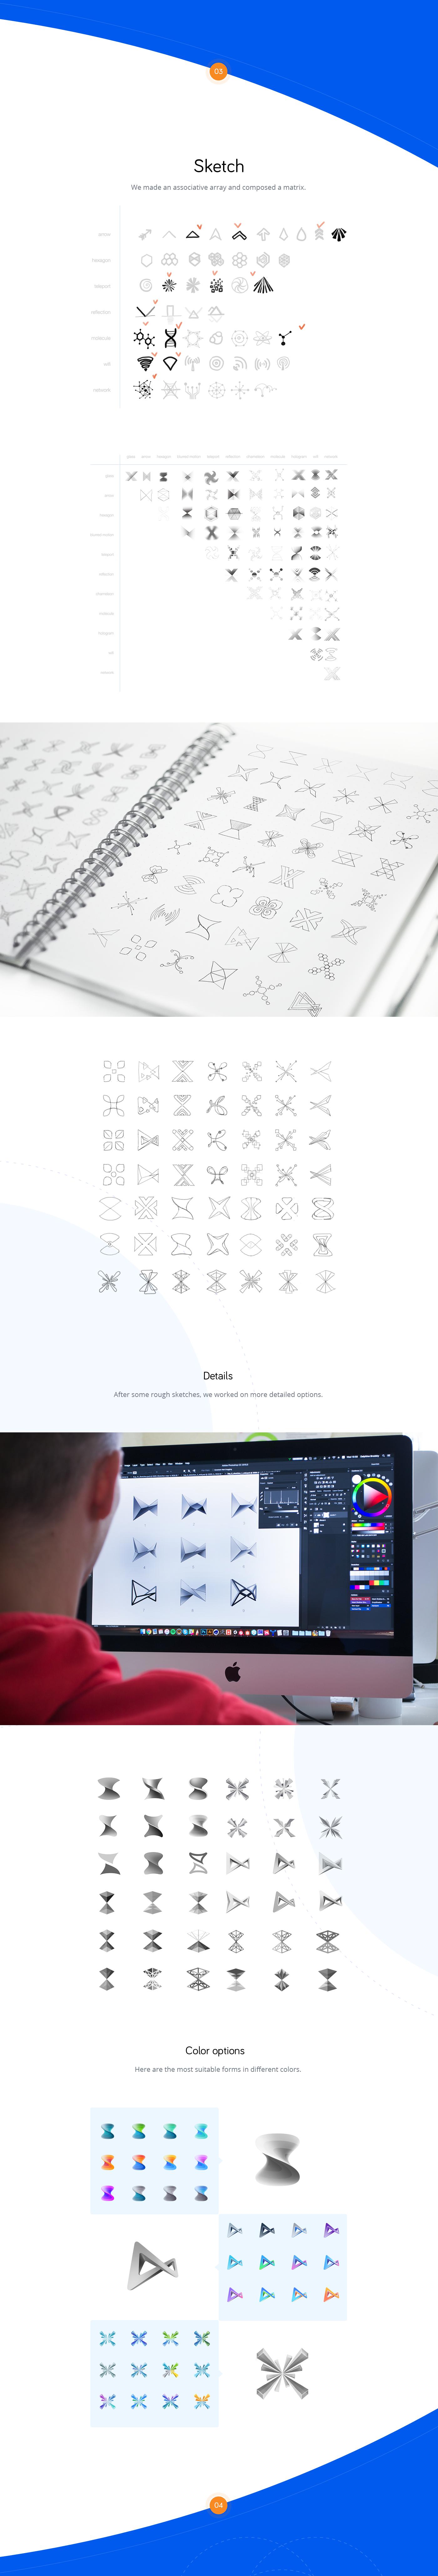 logo brandbook Logotype wordmark color palette rebranding visual identity app branding app icon Brand Design